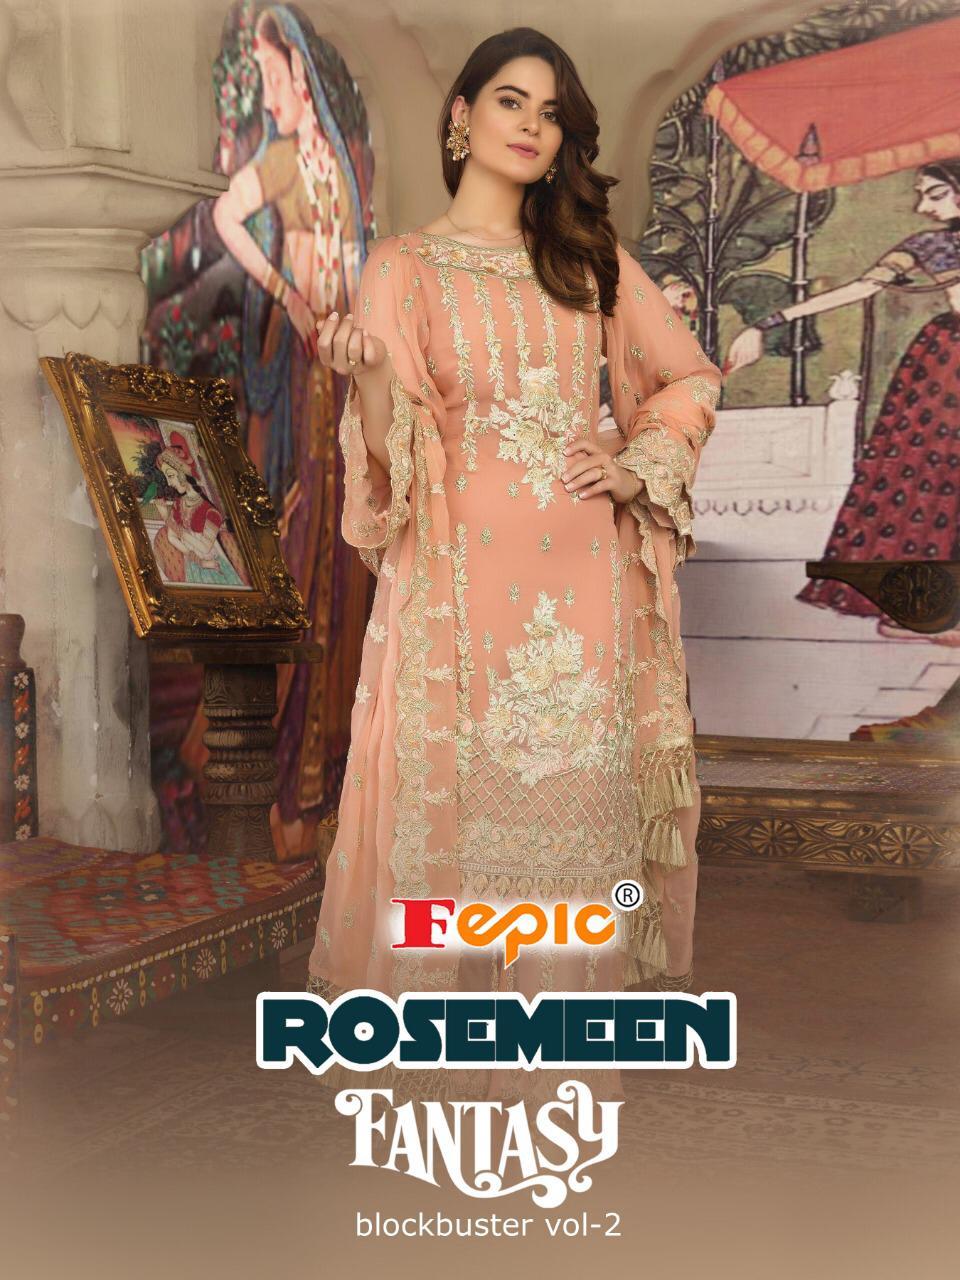 Fepic rosemeen fantasy Blockbuster vol 2 designer embroidered pakistani style dress Material dealer